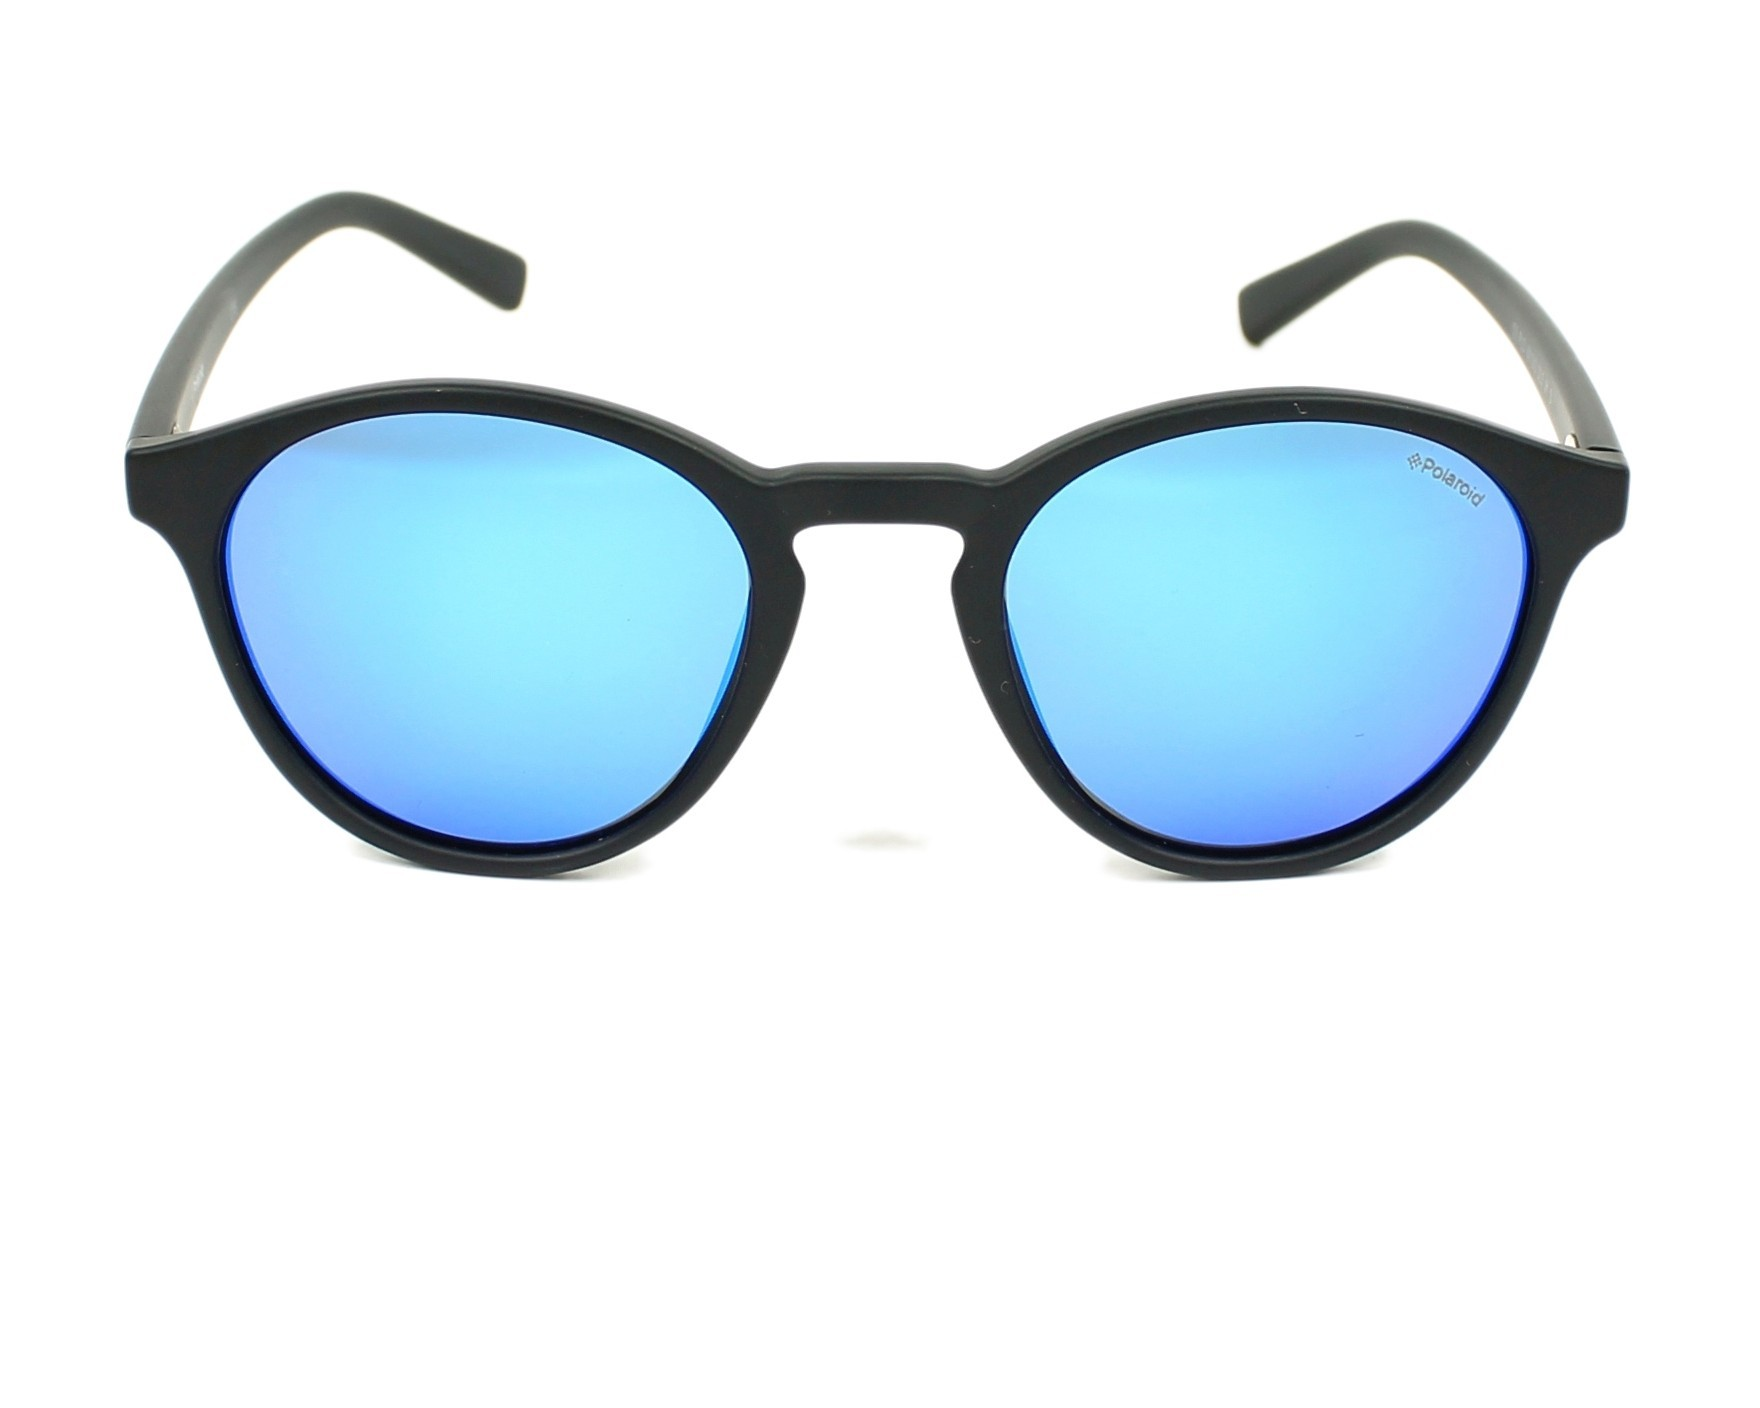 e3abe127837 Sunglasses Polaroid PLD-6013-S DL5 JY 50-22 Black front view